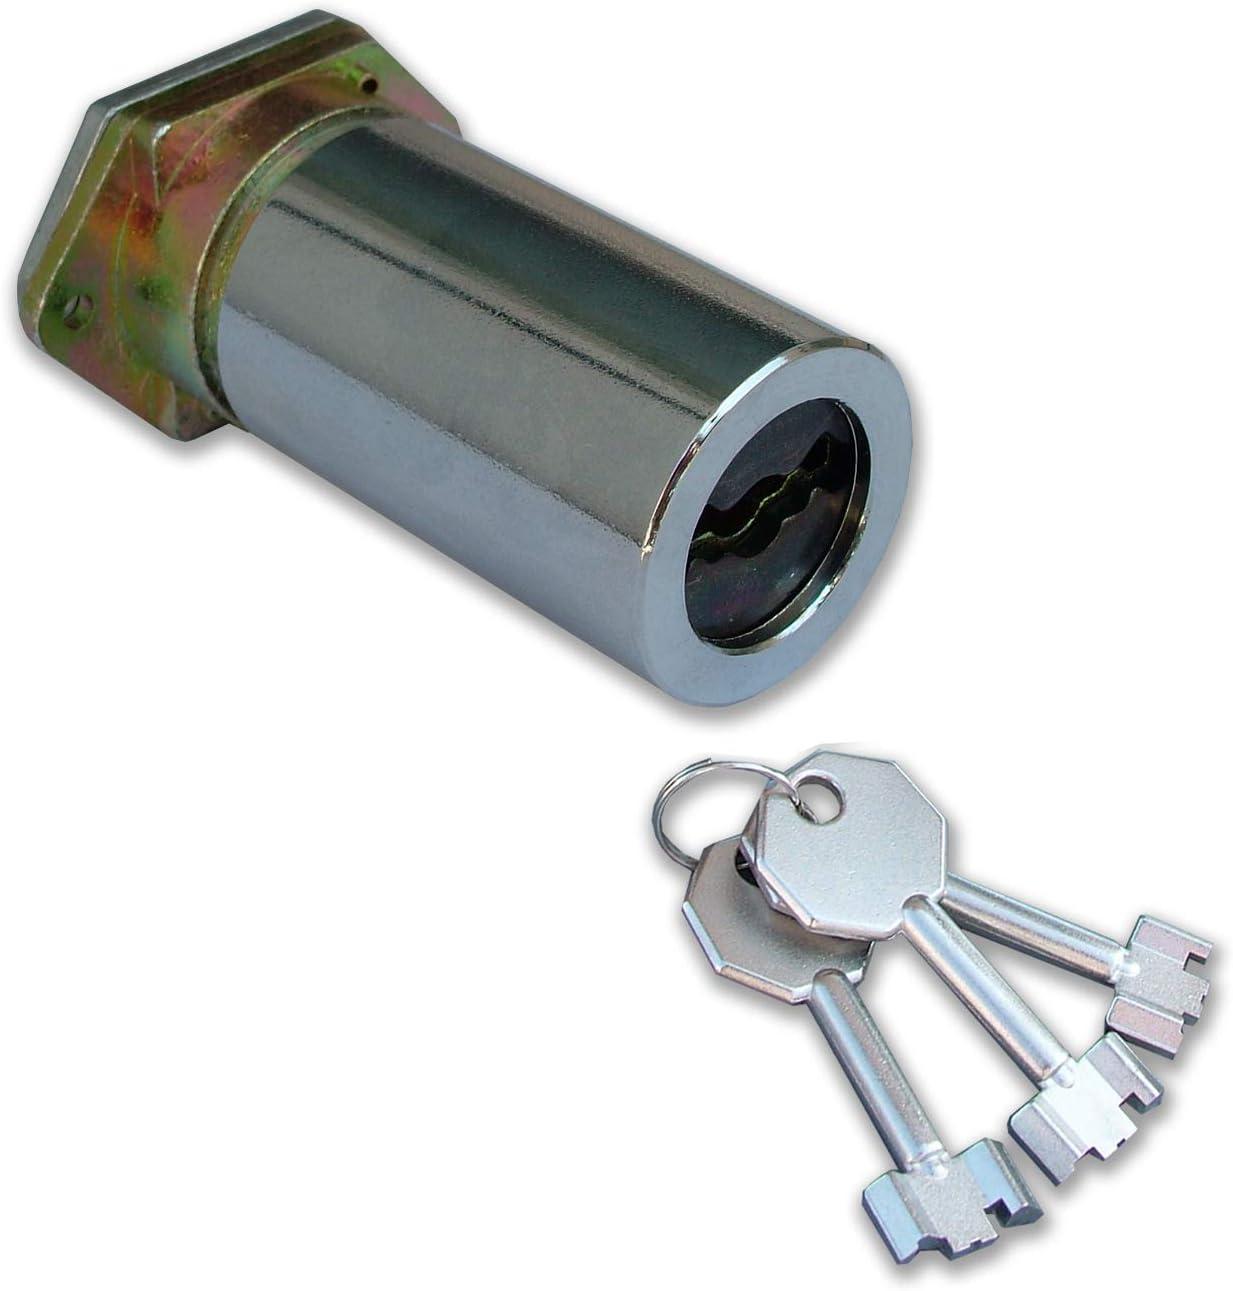 Potent 596TN/6 Bombillo acorazado, 60 mm